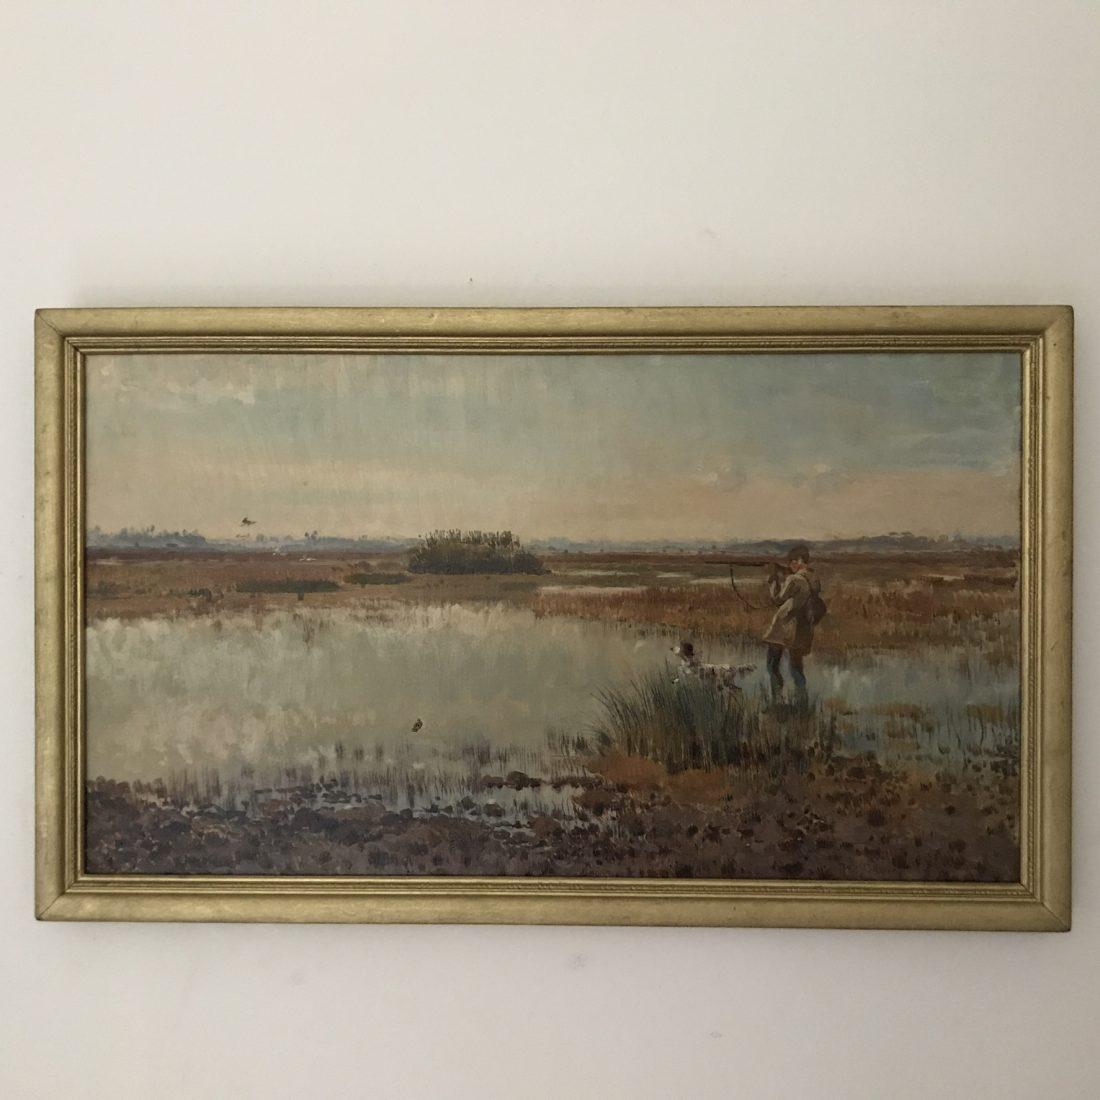 Jager met hond op open vlakte, Frans David Oerder (1867 – 1944)